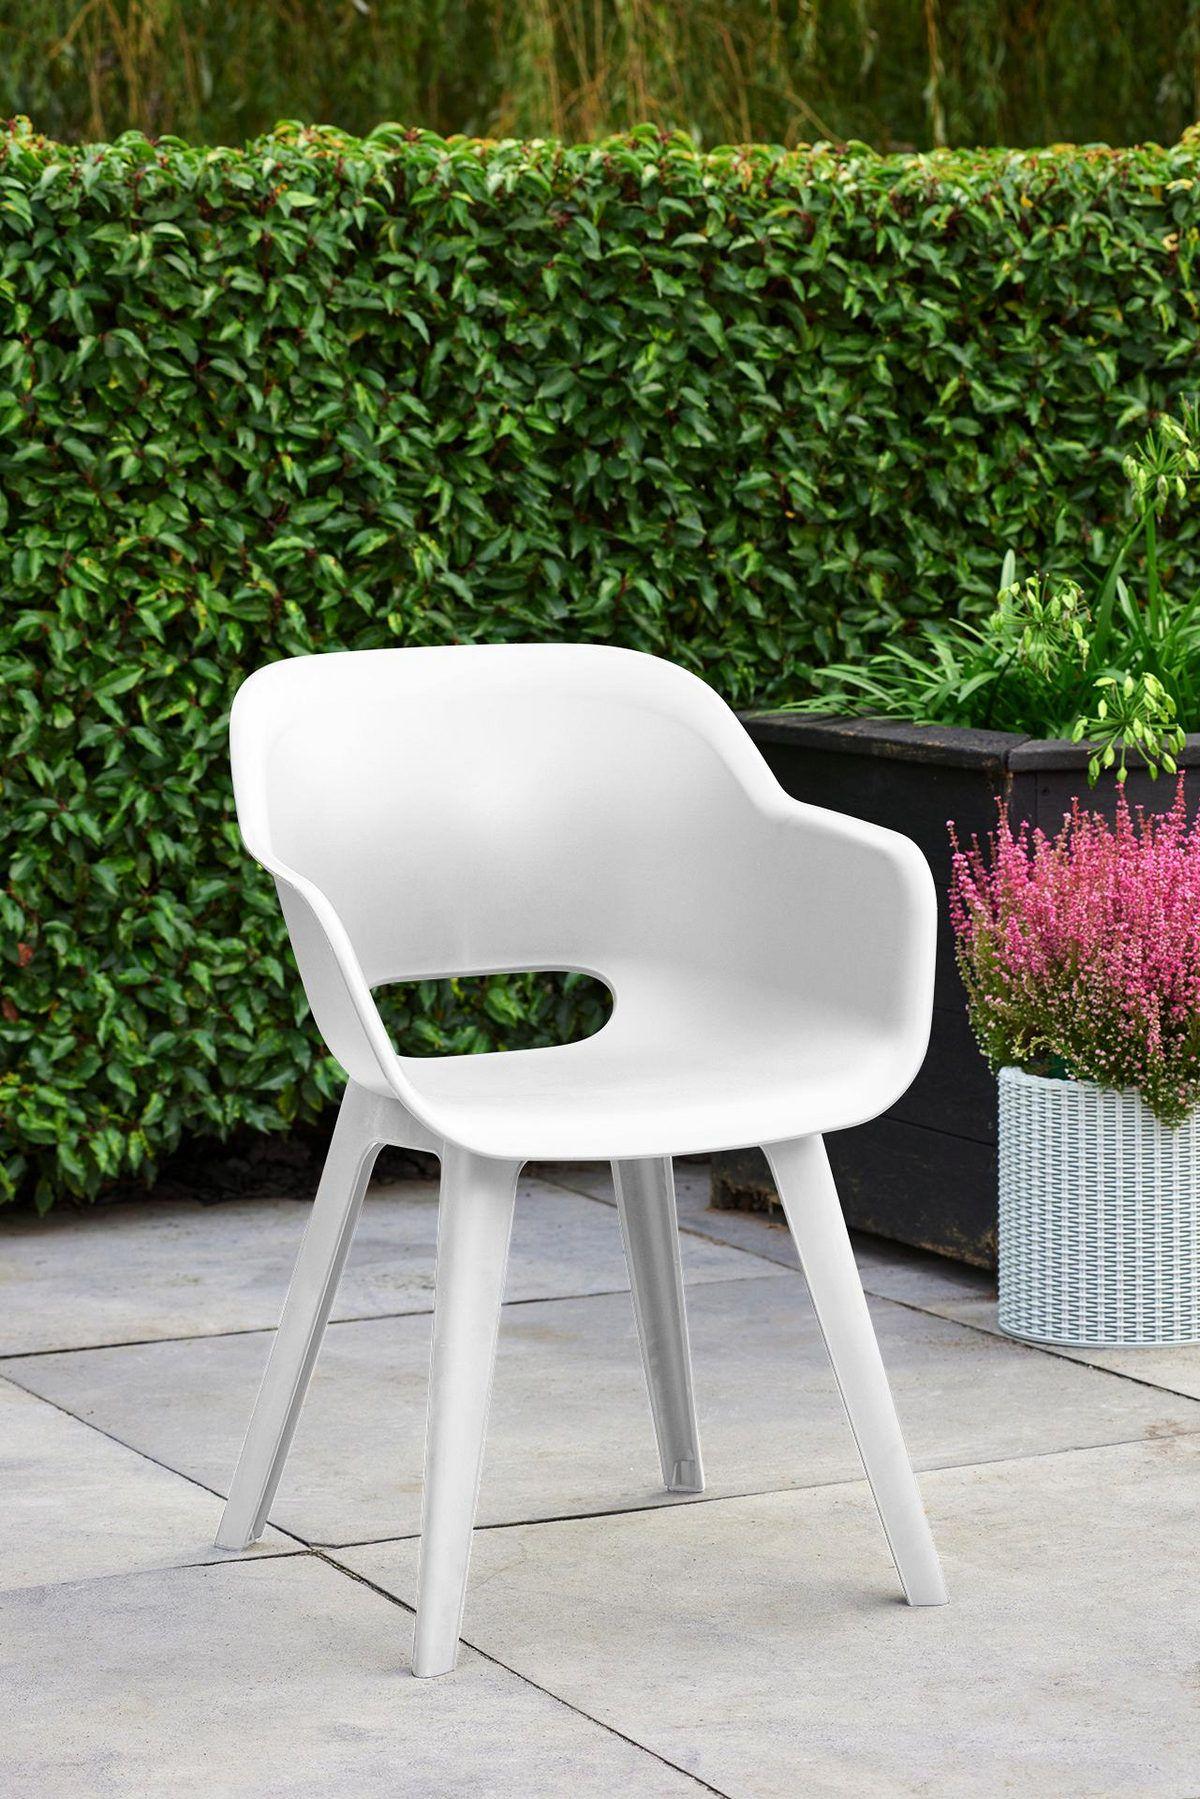 Gartensessel In Kunststoff Weiss In 2020 Gartenstuhle